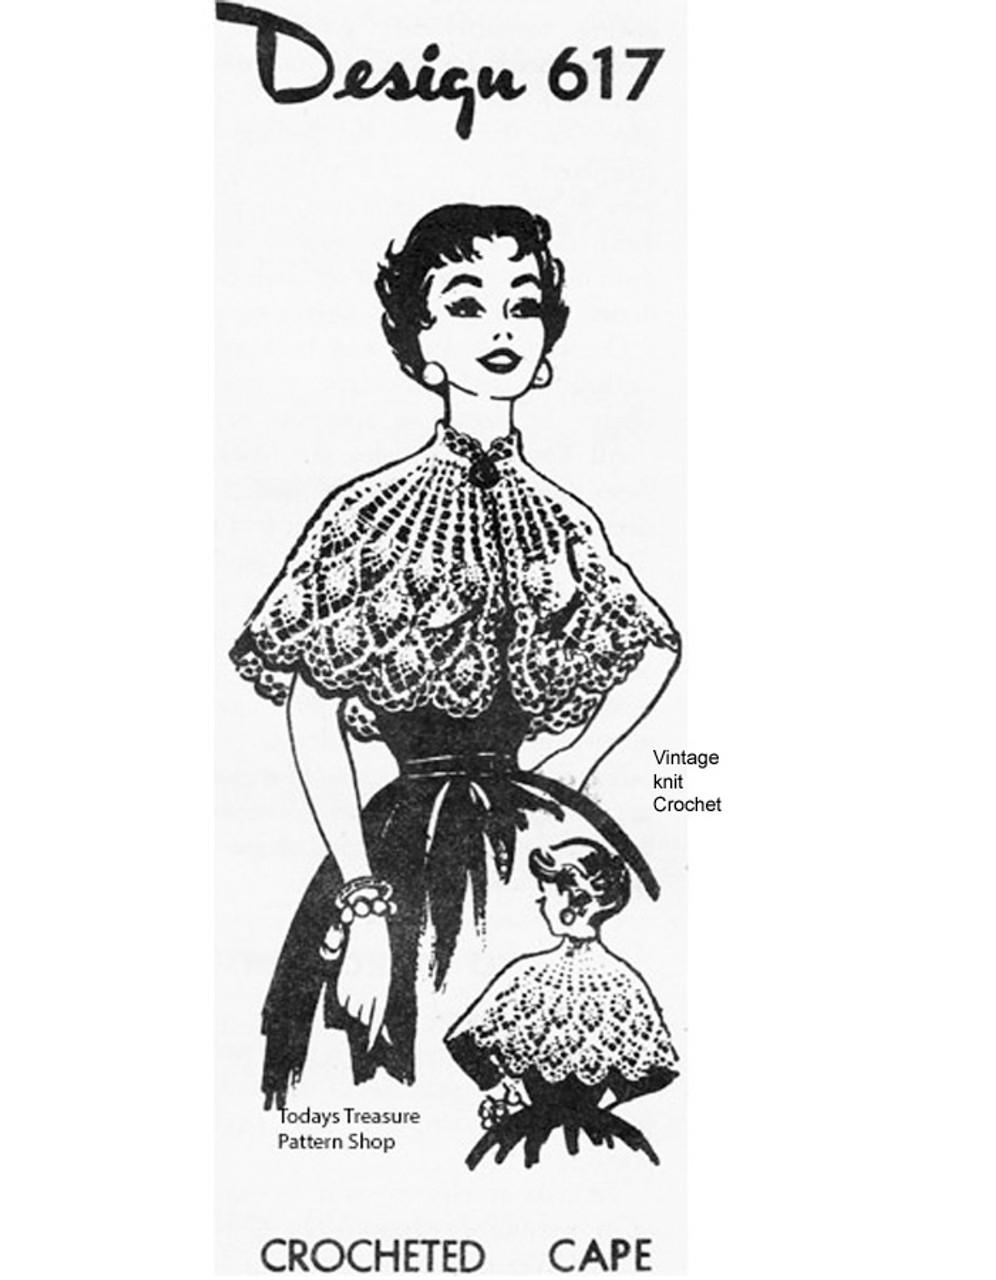 Crochet Pineapple Capelet Pattern Mail Order 617